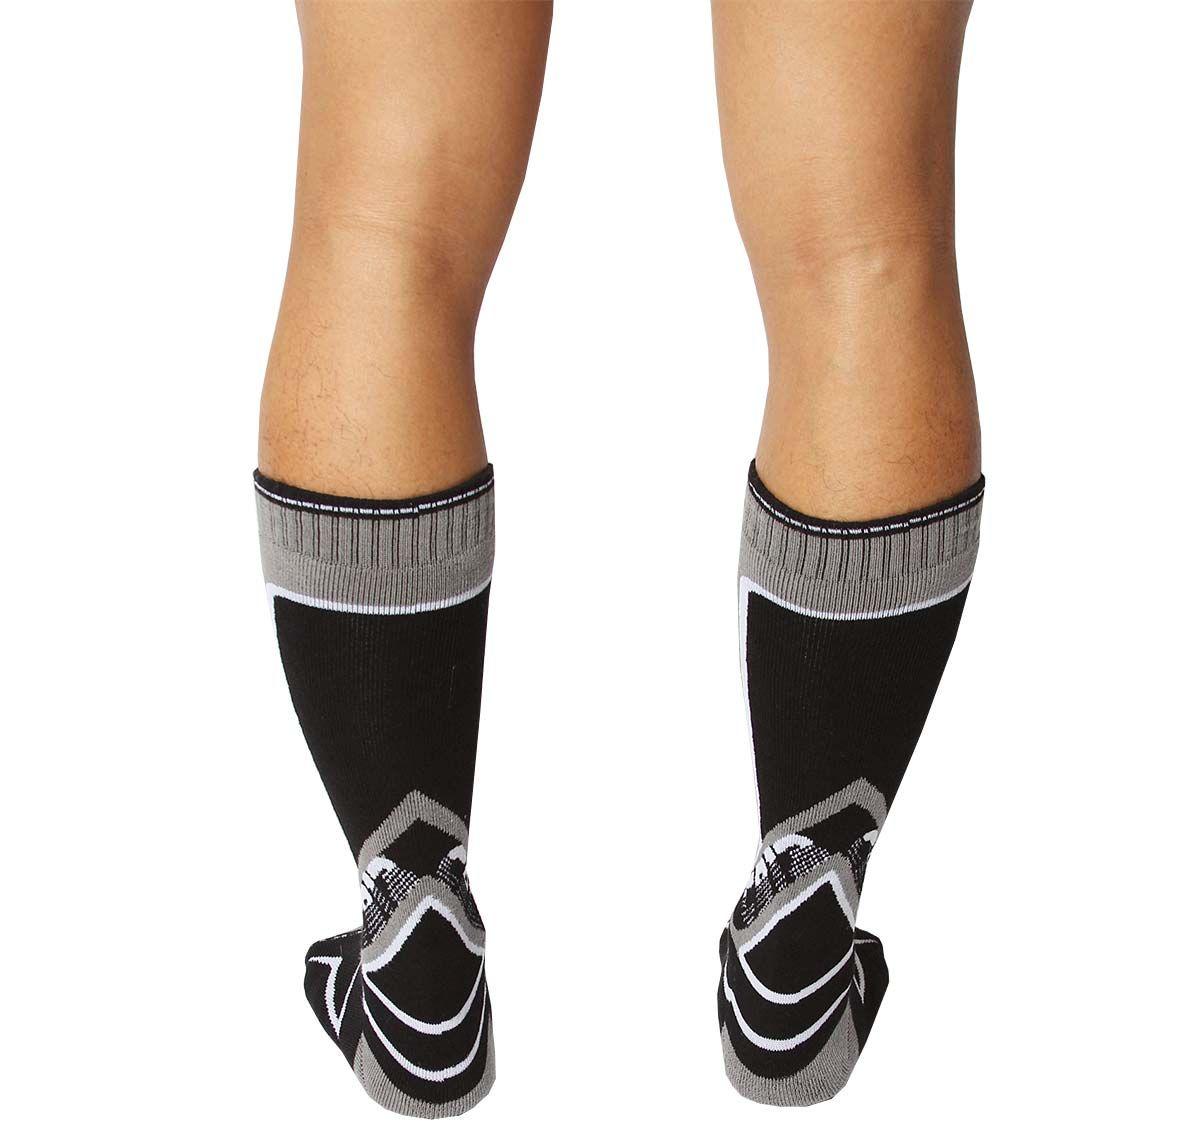 Cellblock 13 Sports socks KENNEL CLUB Mid-Calf SOCK, grey